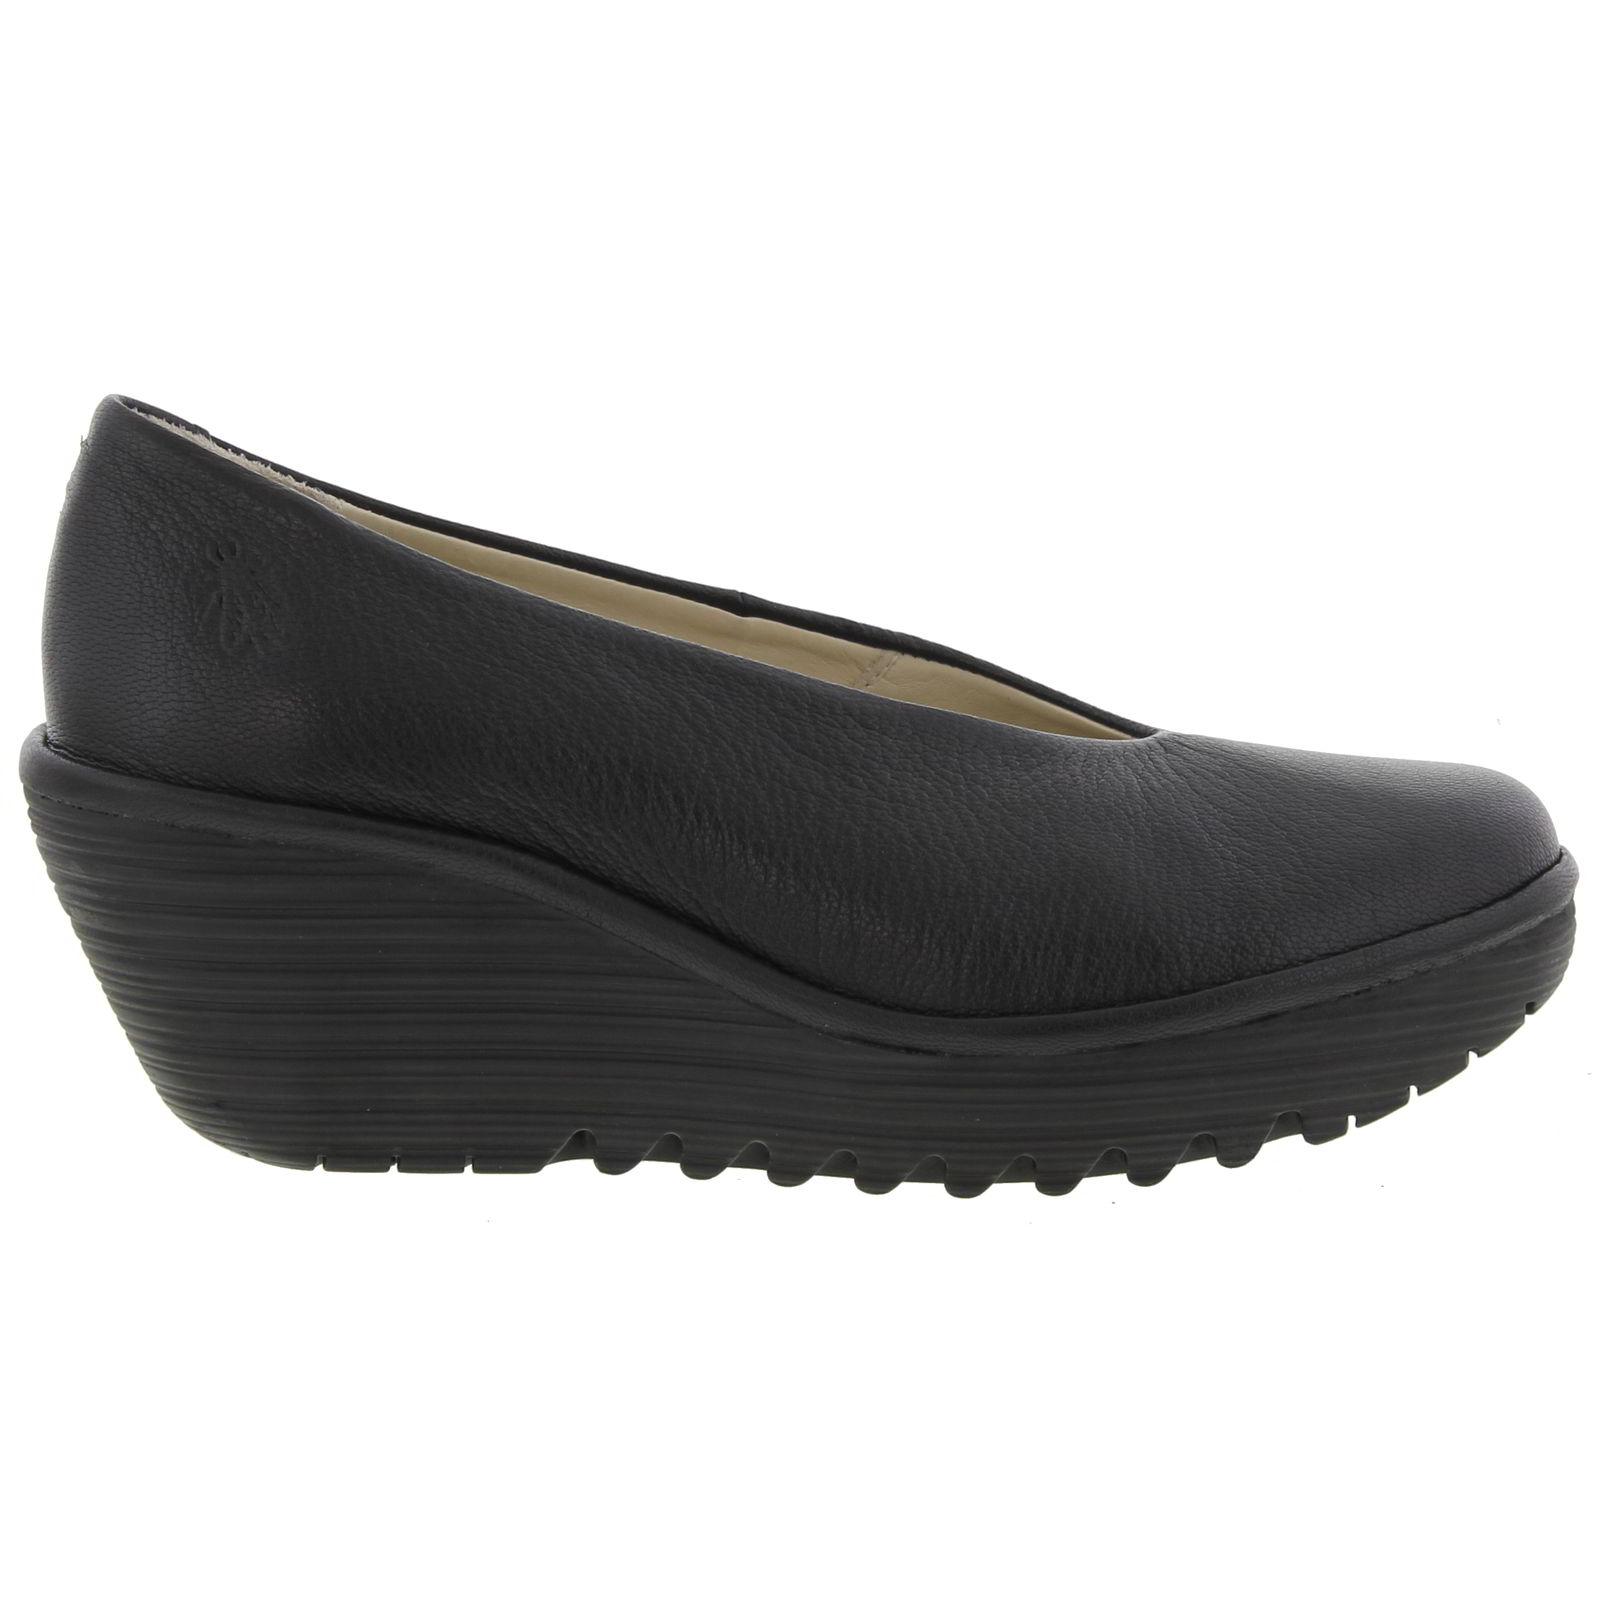 Fly London Womens Yaz Slip On Wedge Shoes - Black